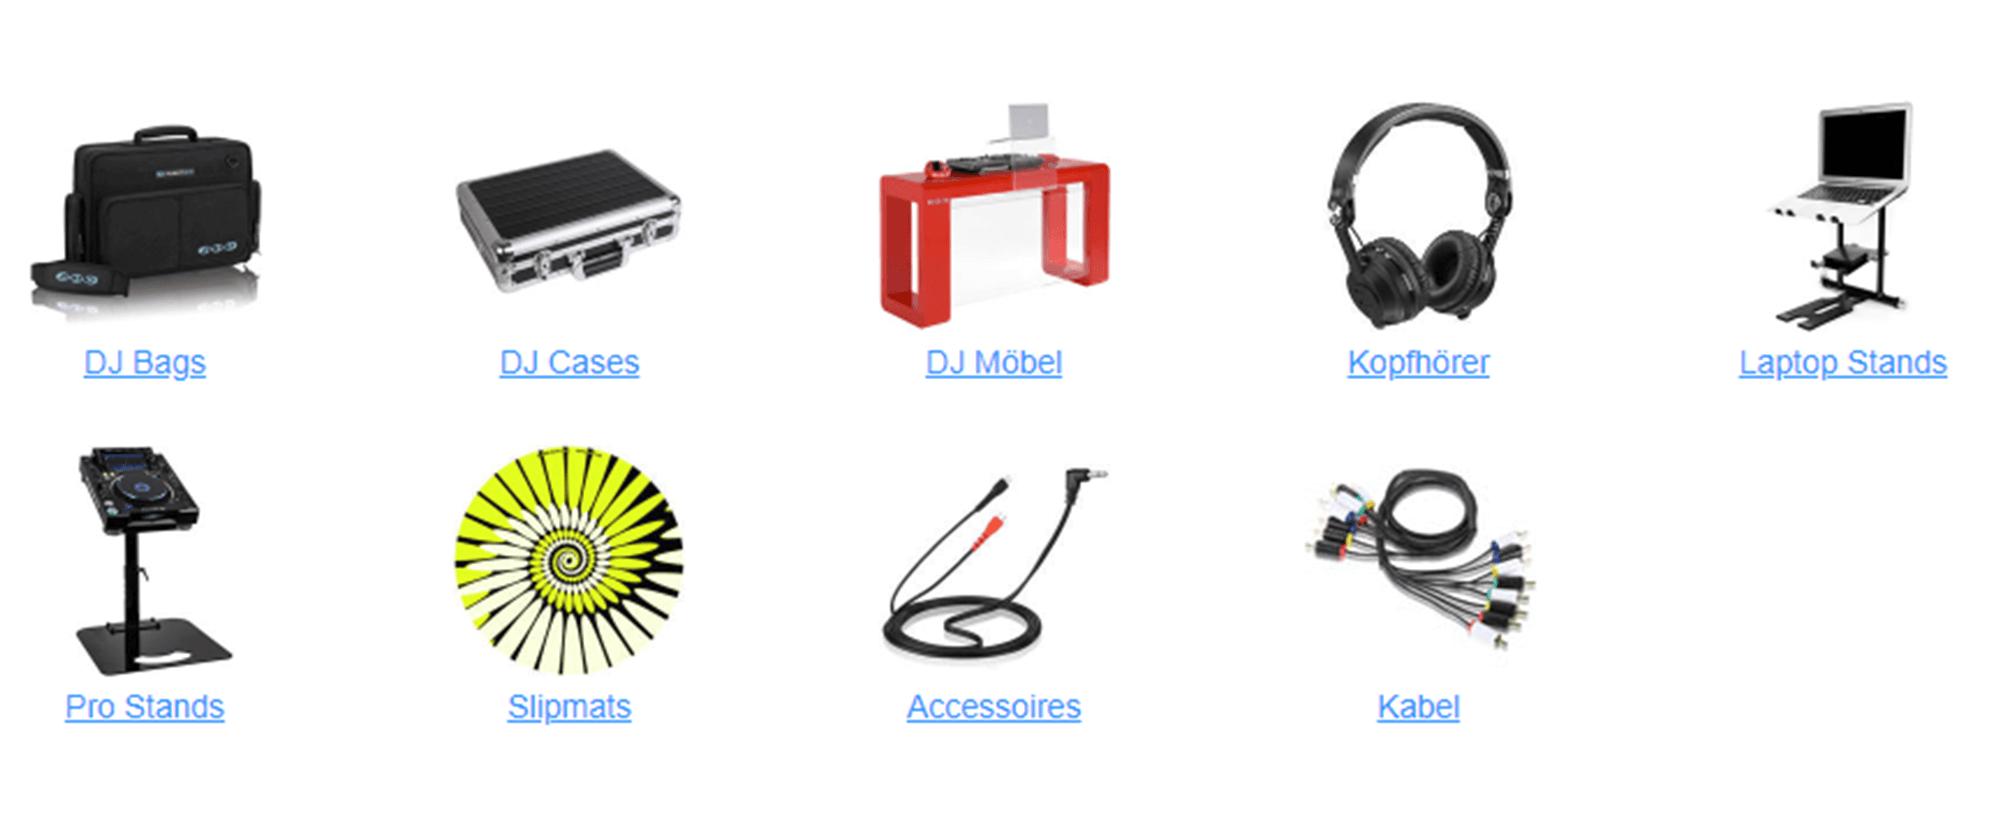 Brandcrock-zomo - Products